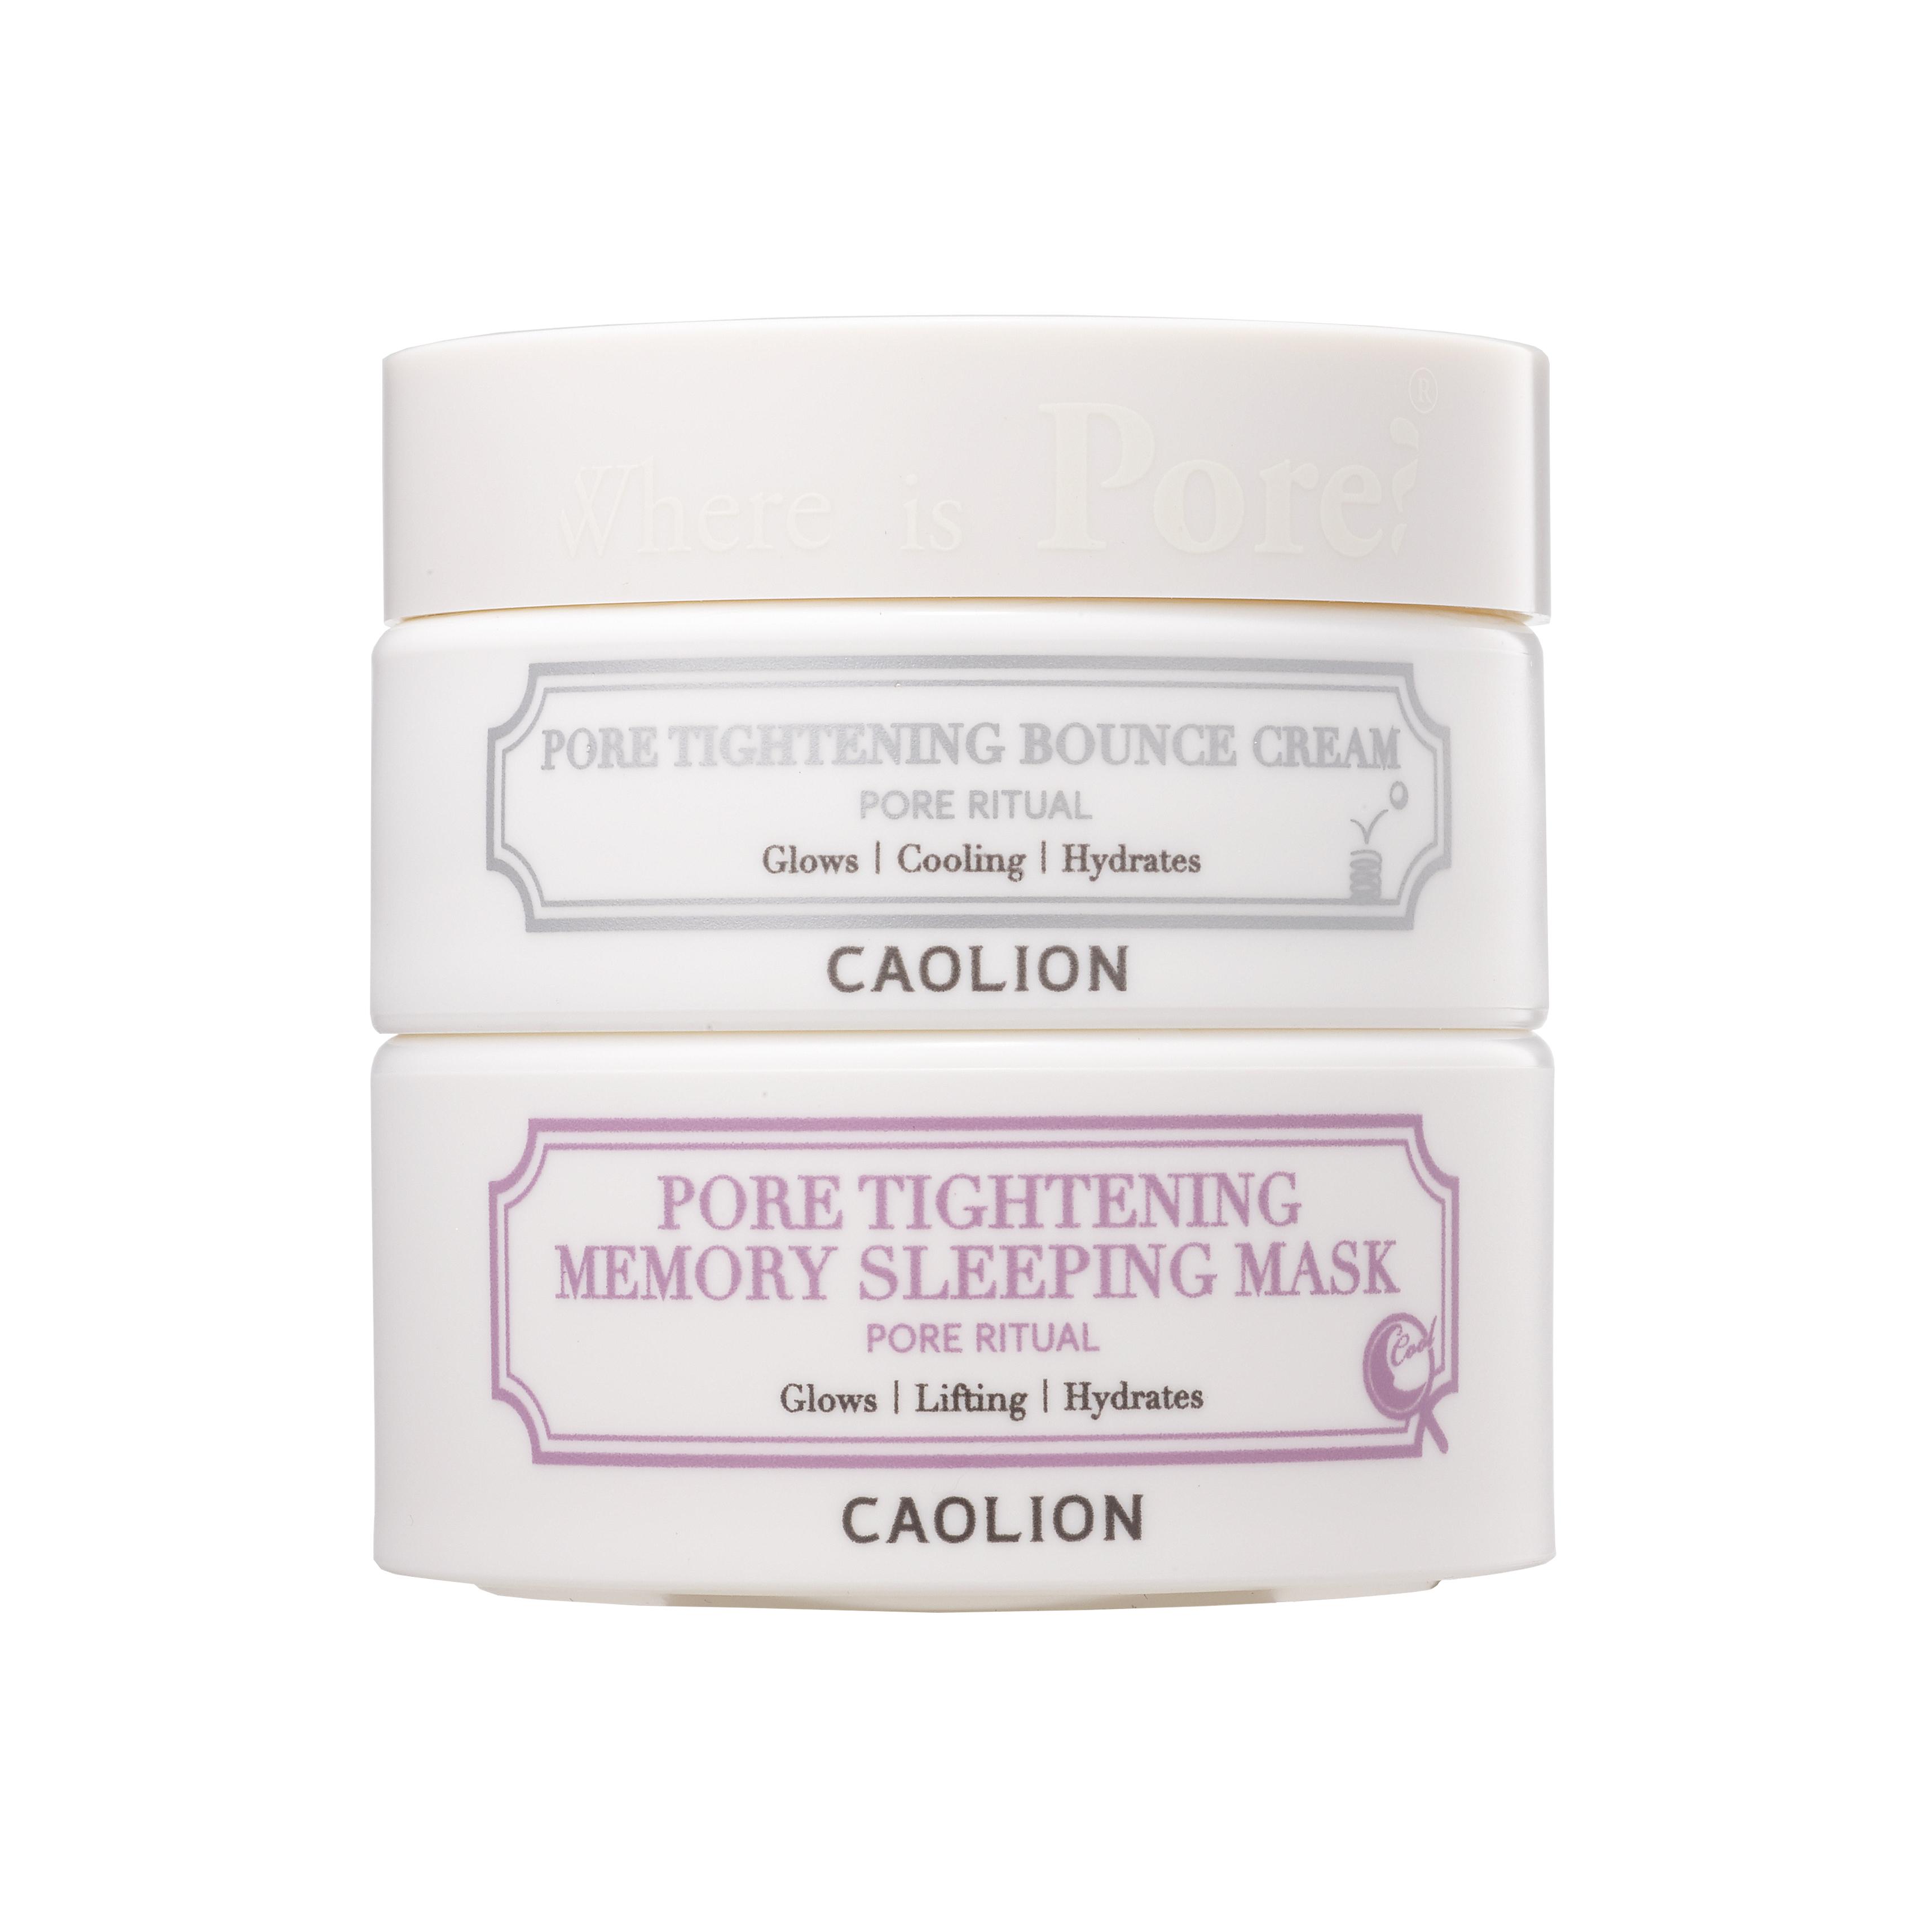 Caolion Pore Tightening Day & Night Glow Duo (Pore Tightening Bounce Cream)